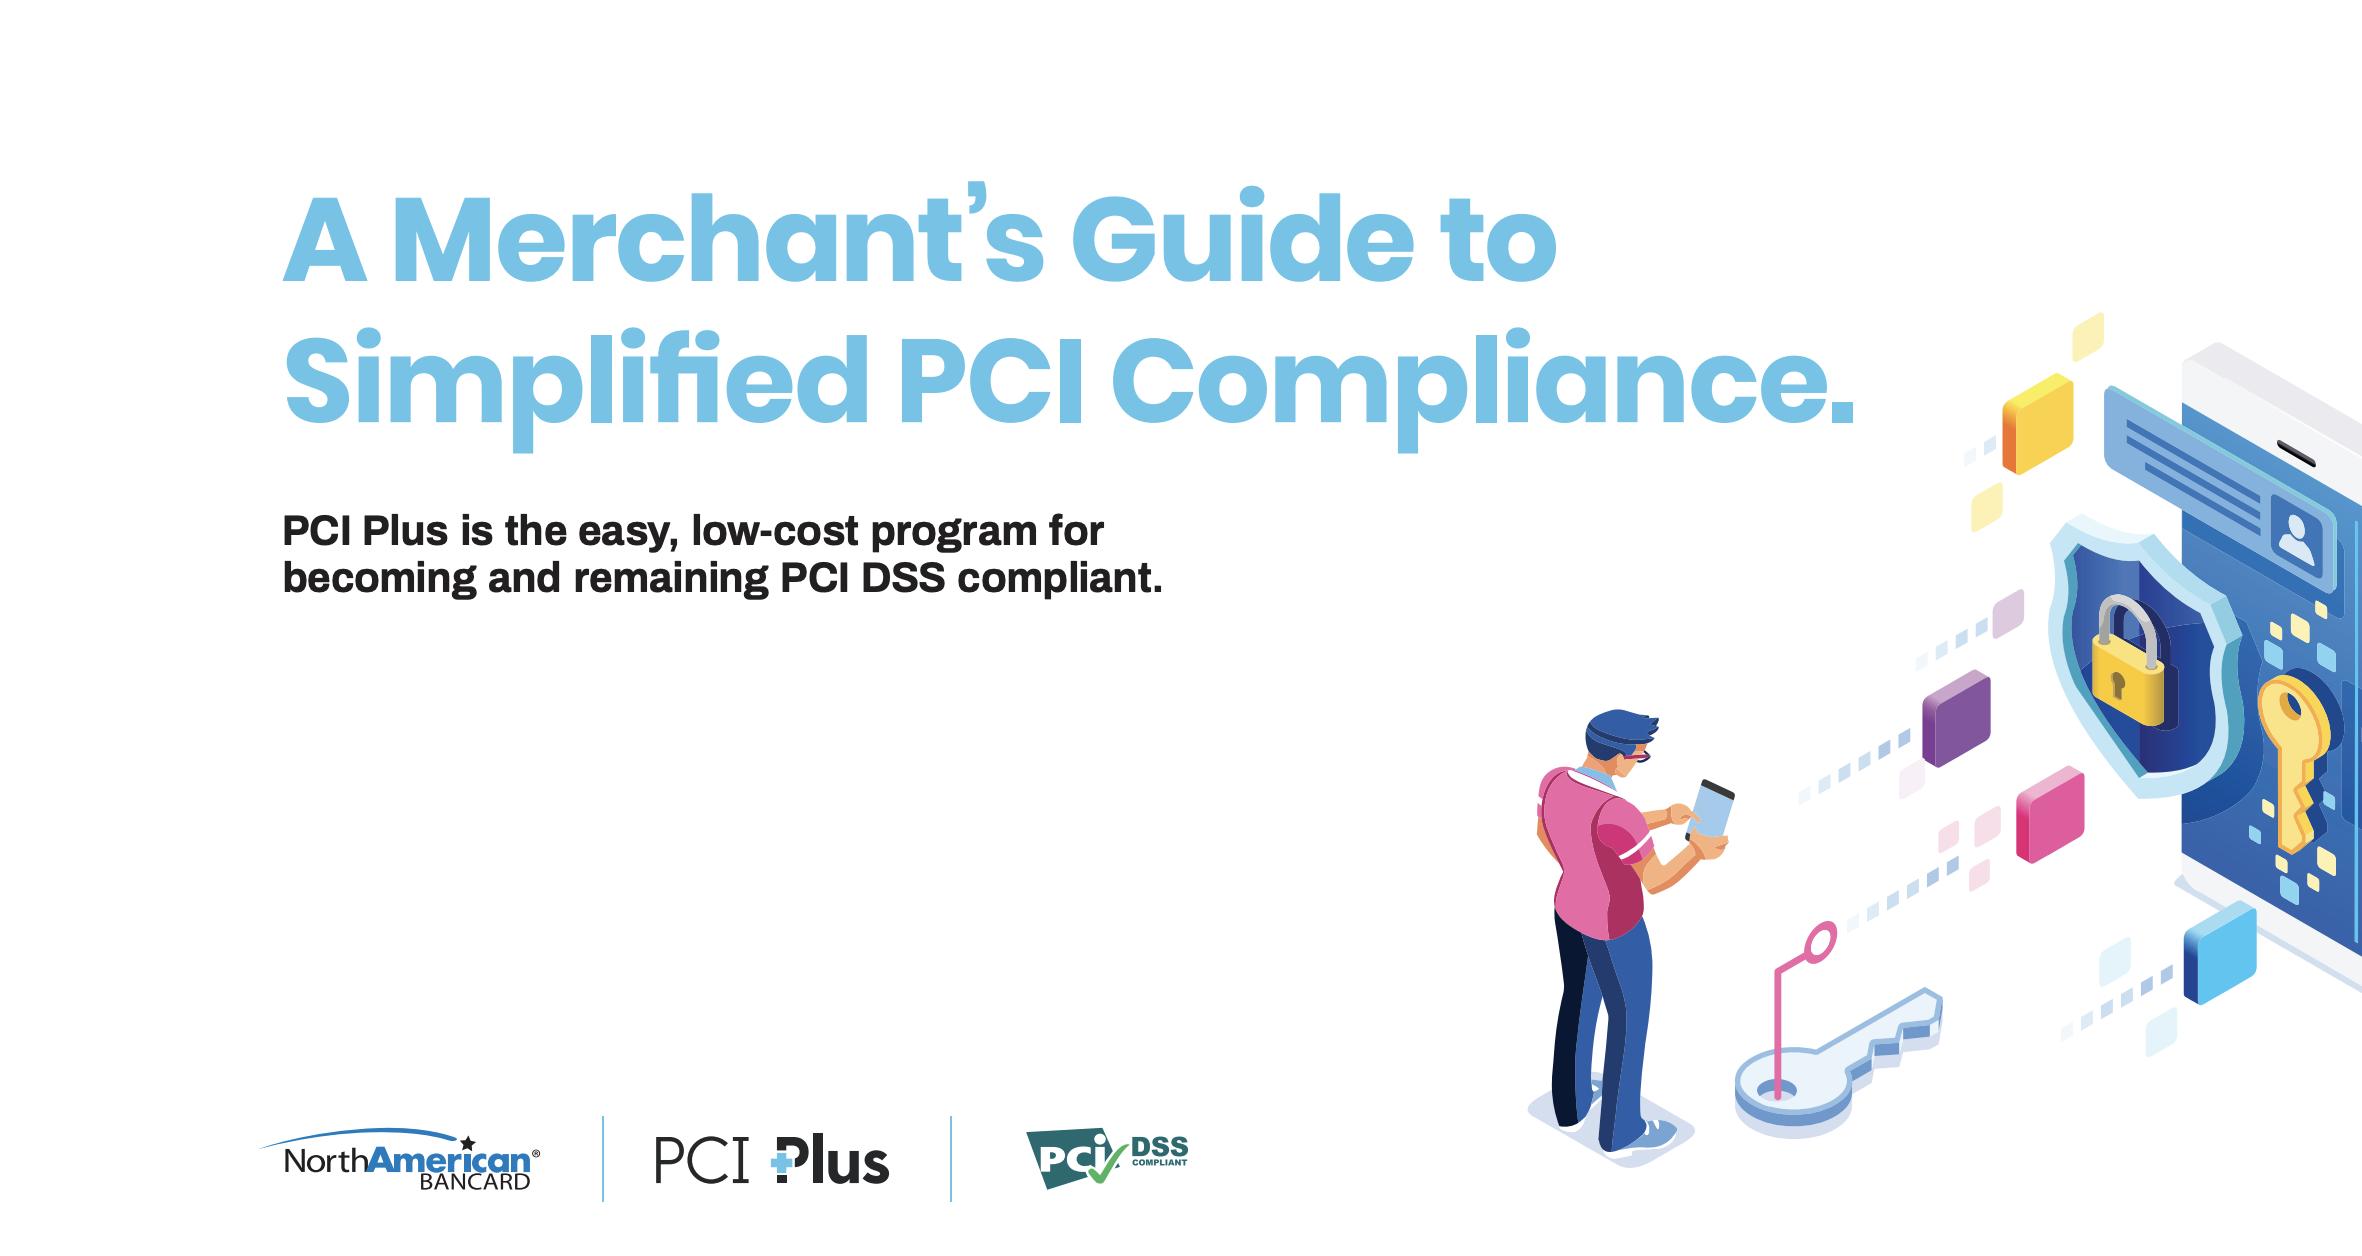 PCI Plus has arrived!